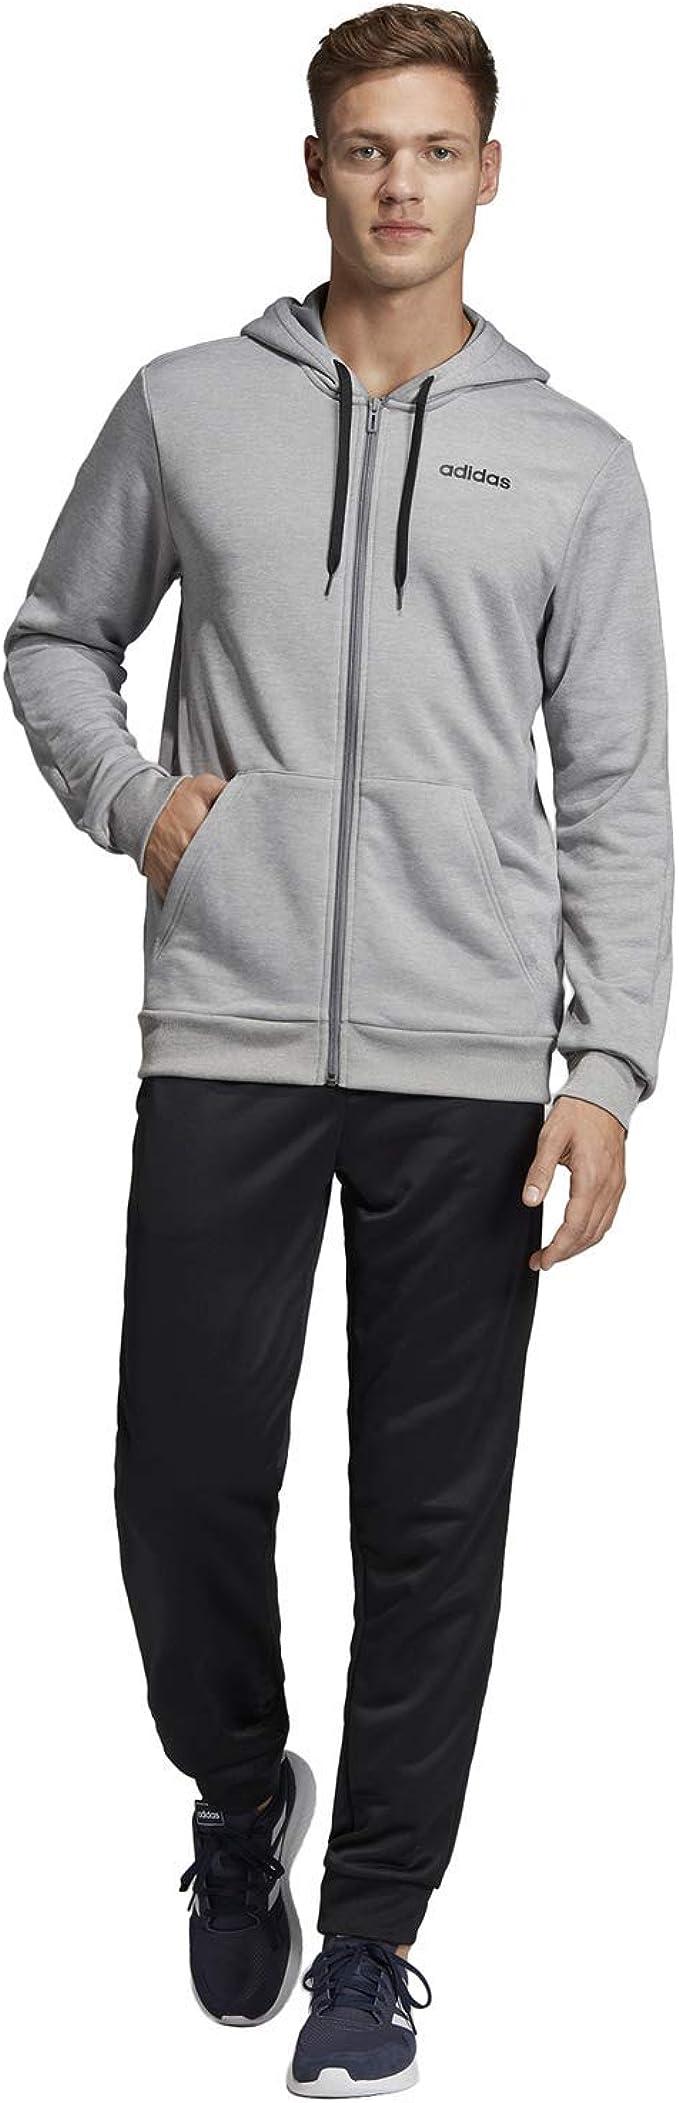 adidas MTS Lin Ft Hood Chándal, Hombre: Amazon.es: Deportes y aire ...